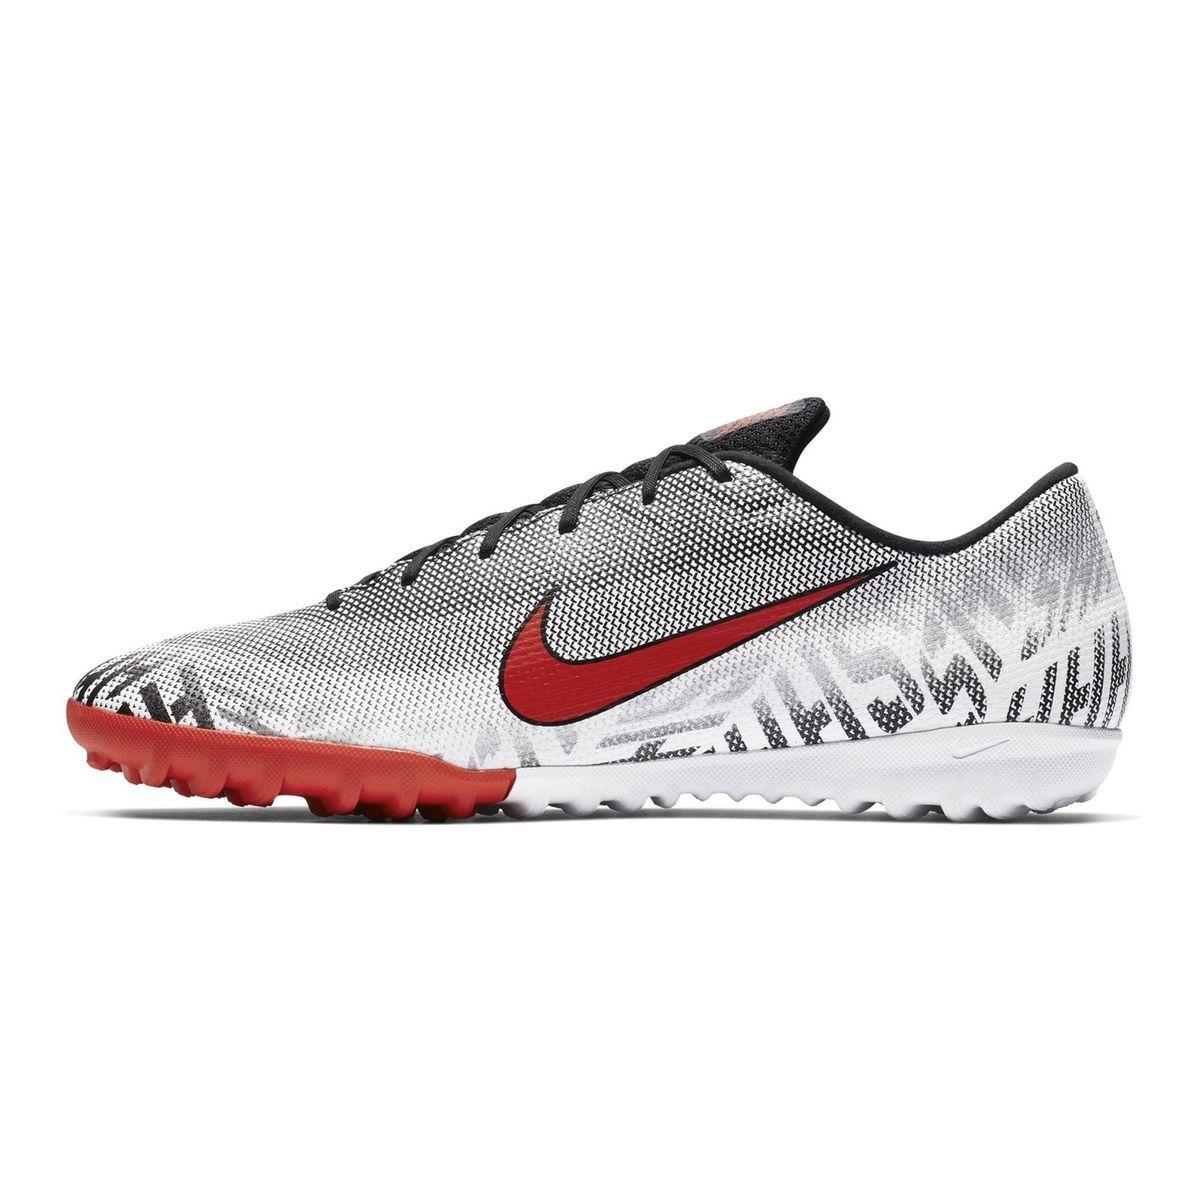 Chaussures Football Nike Mercurialx Vapor Xii Silencio